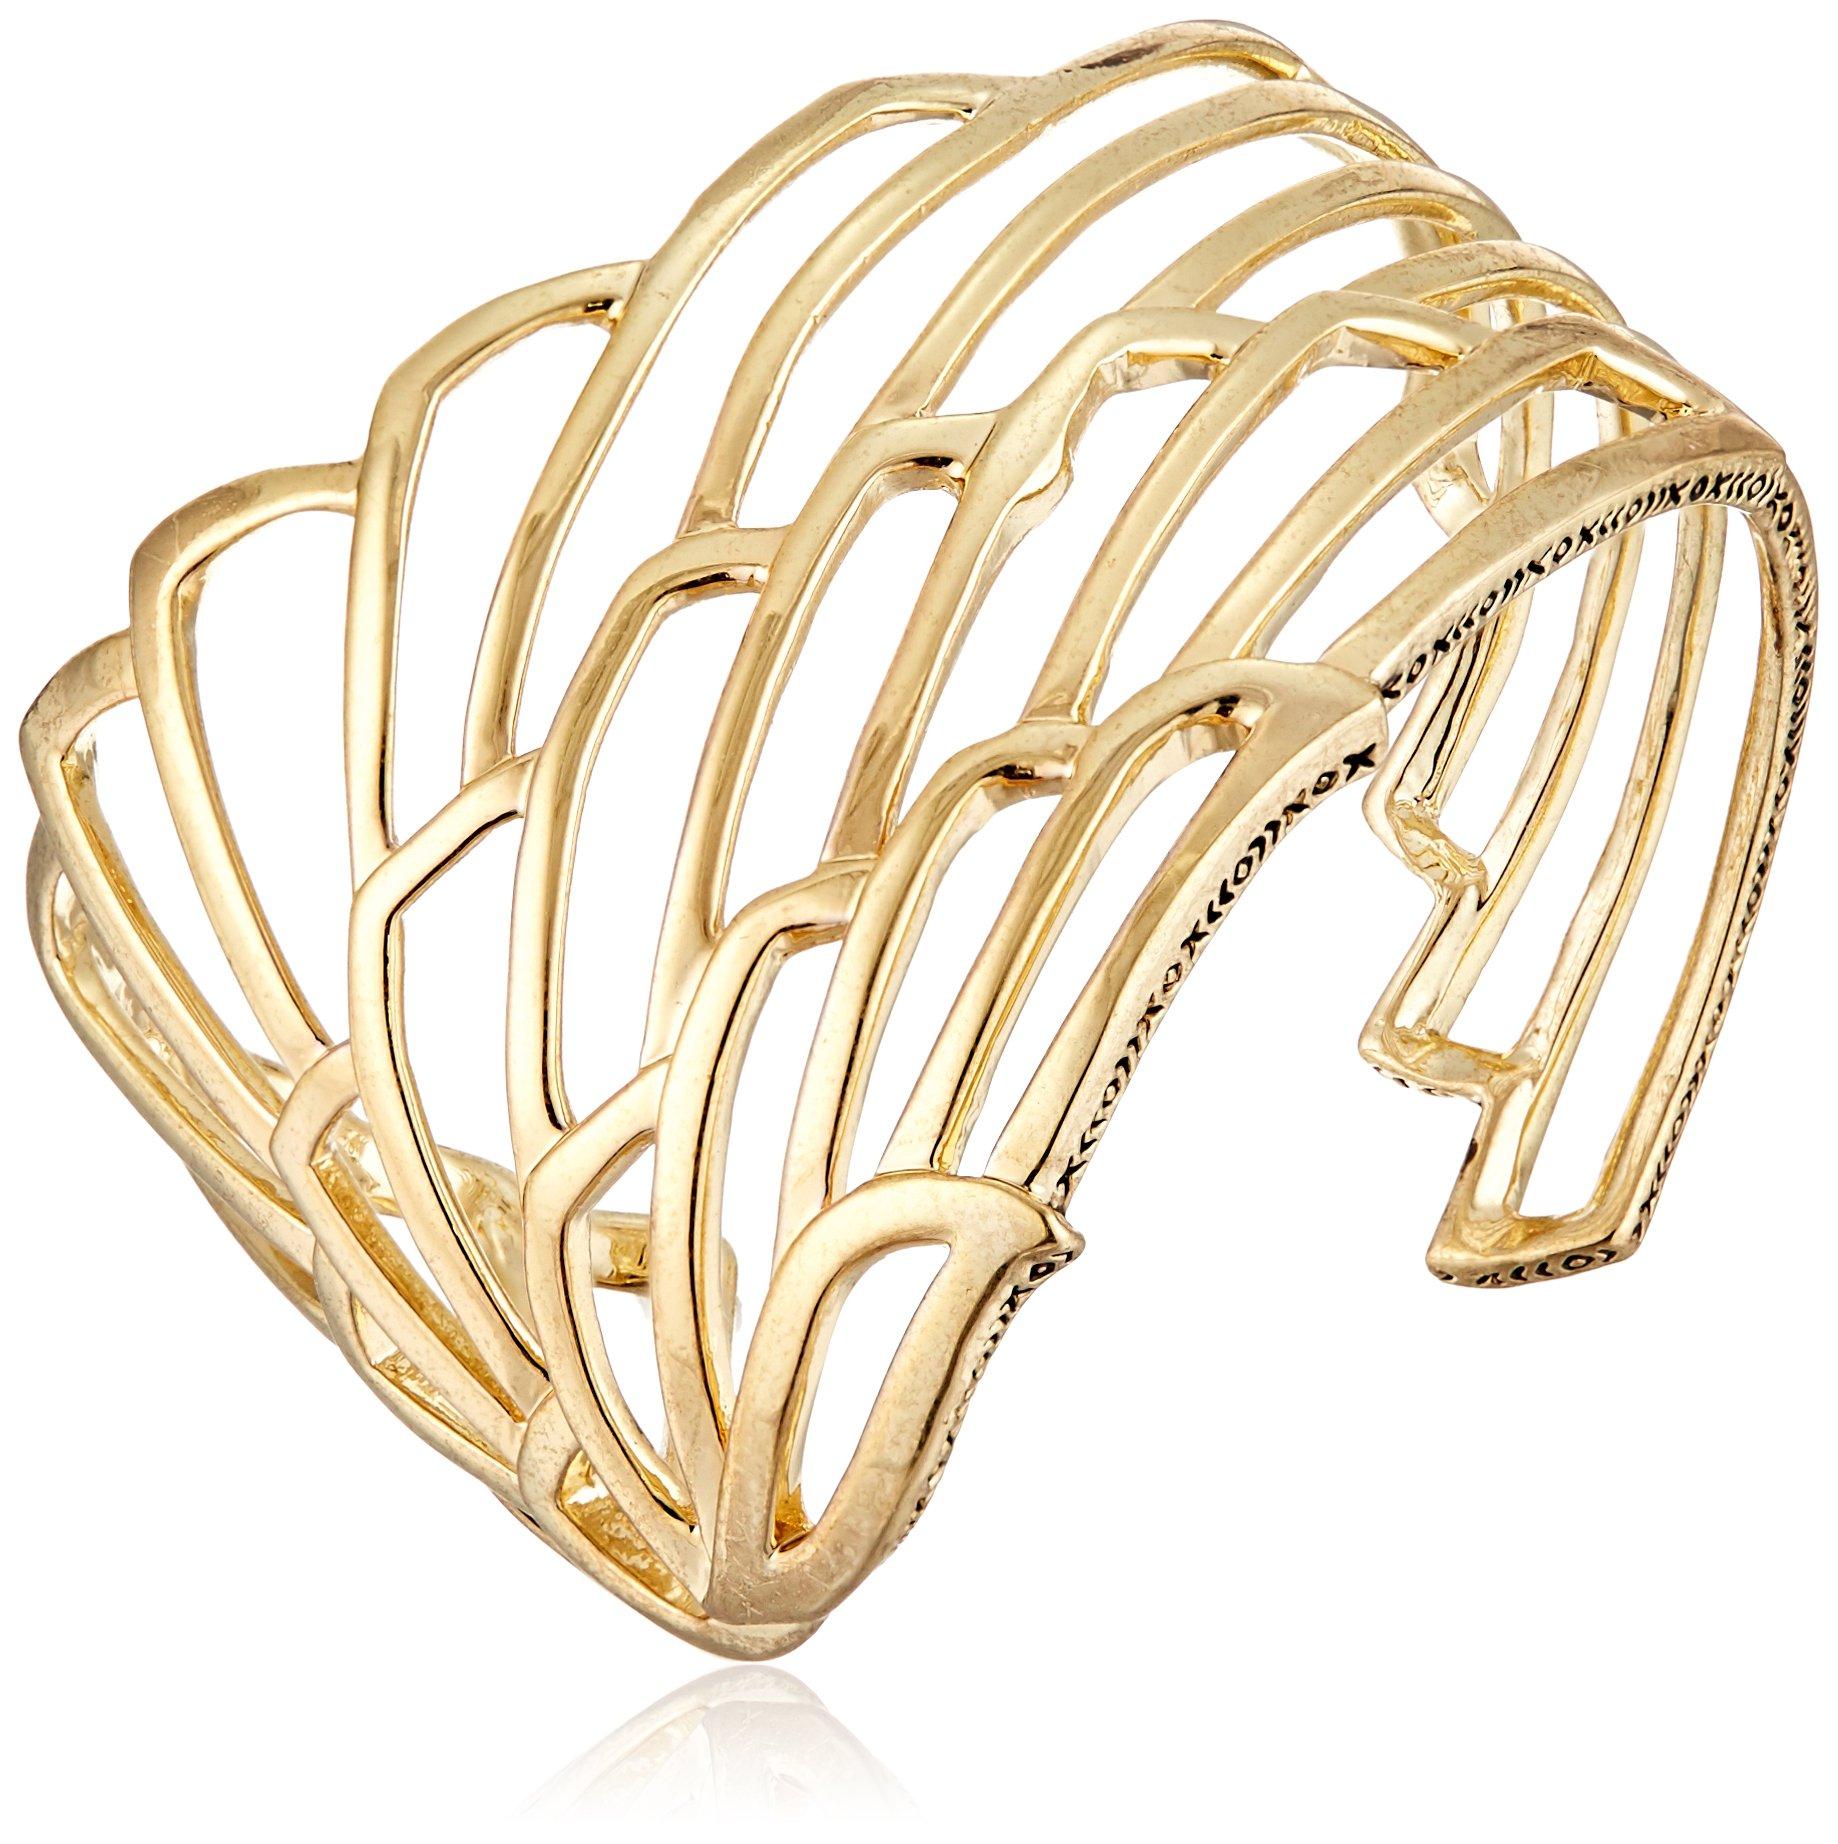 House of Harlow 1960 The Avium Cuff Bracelet